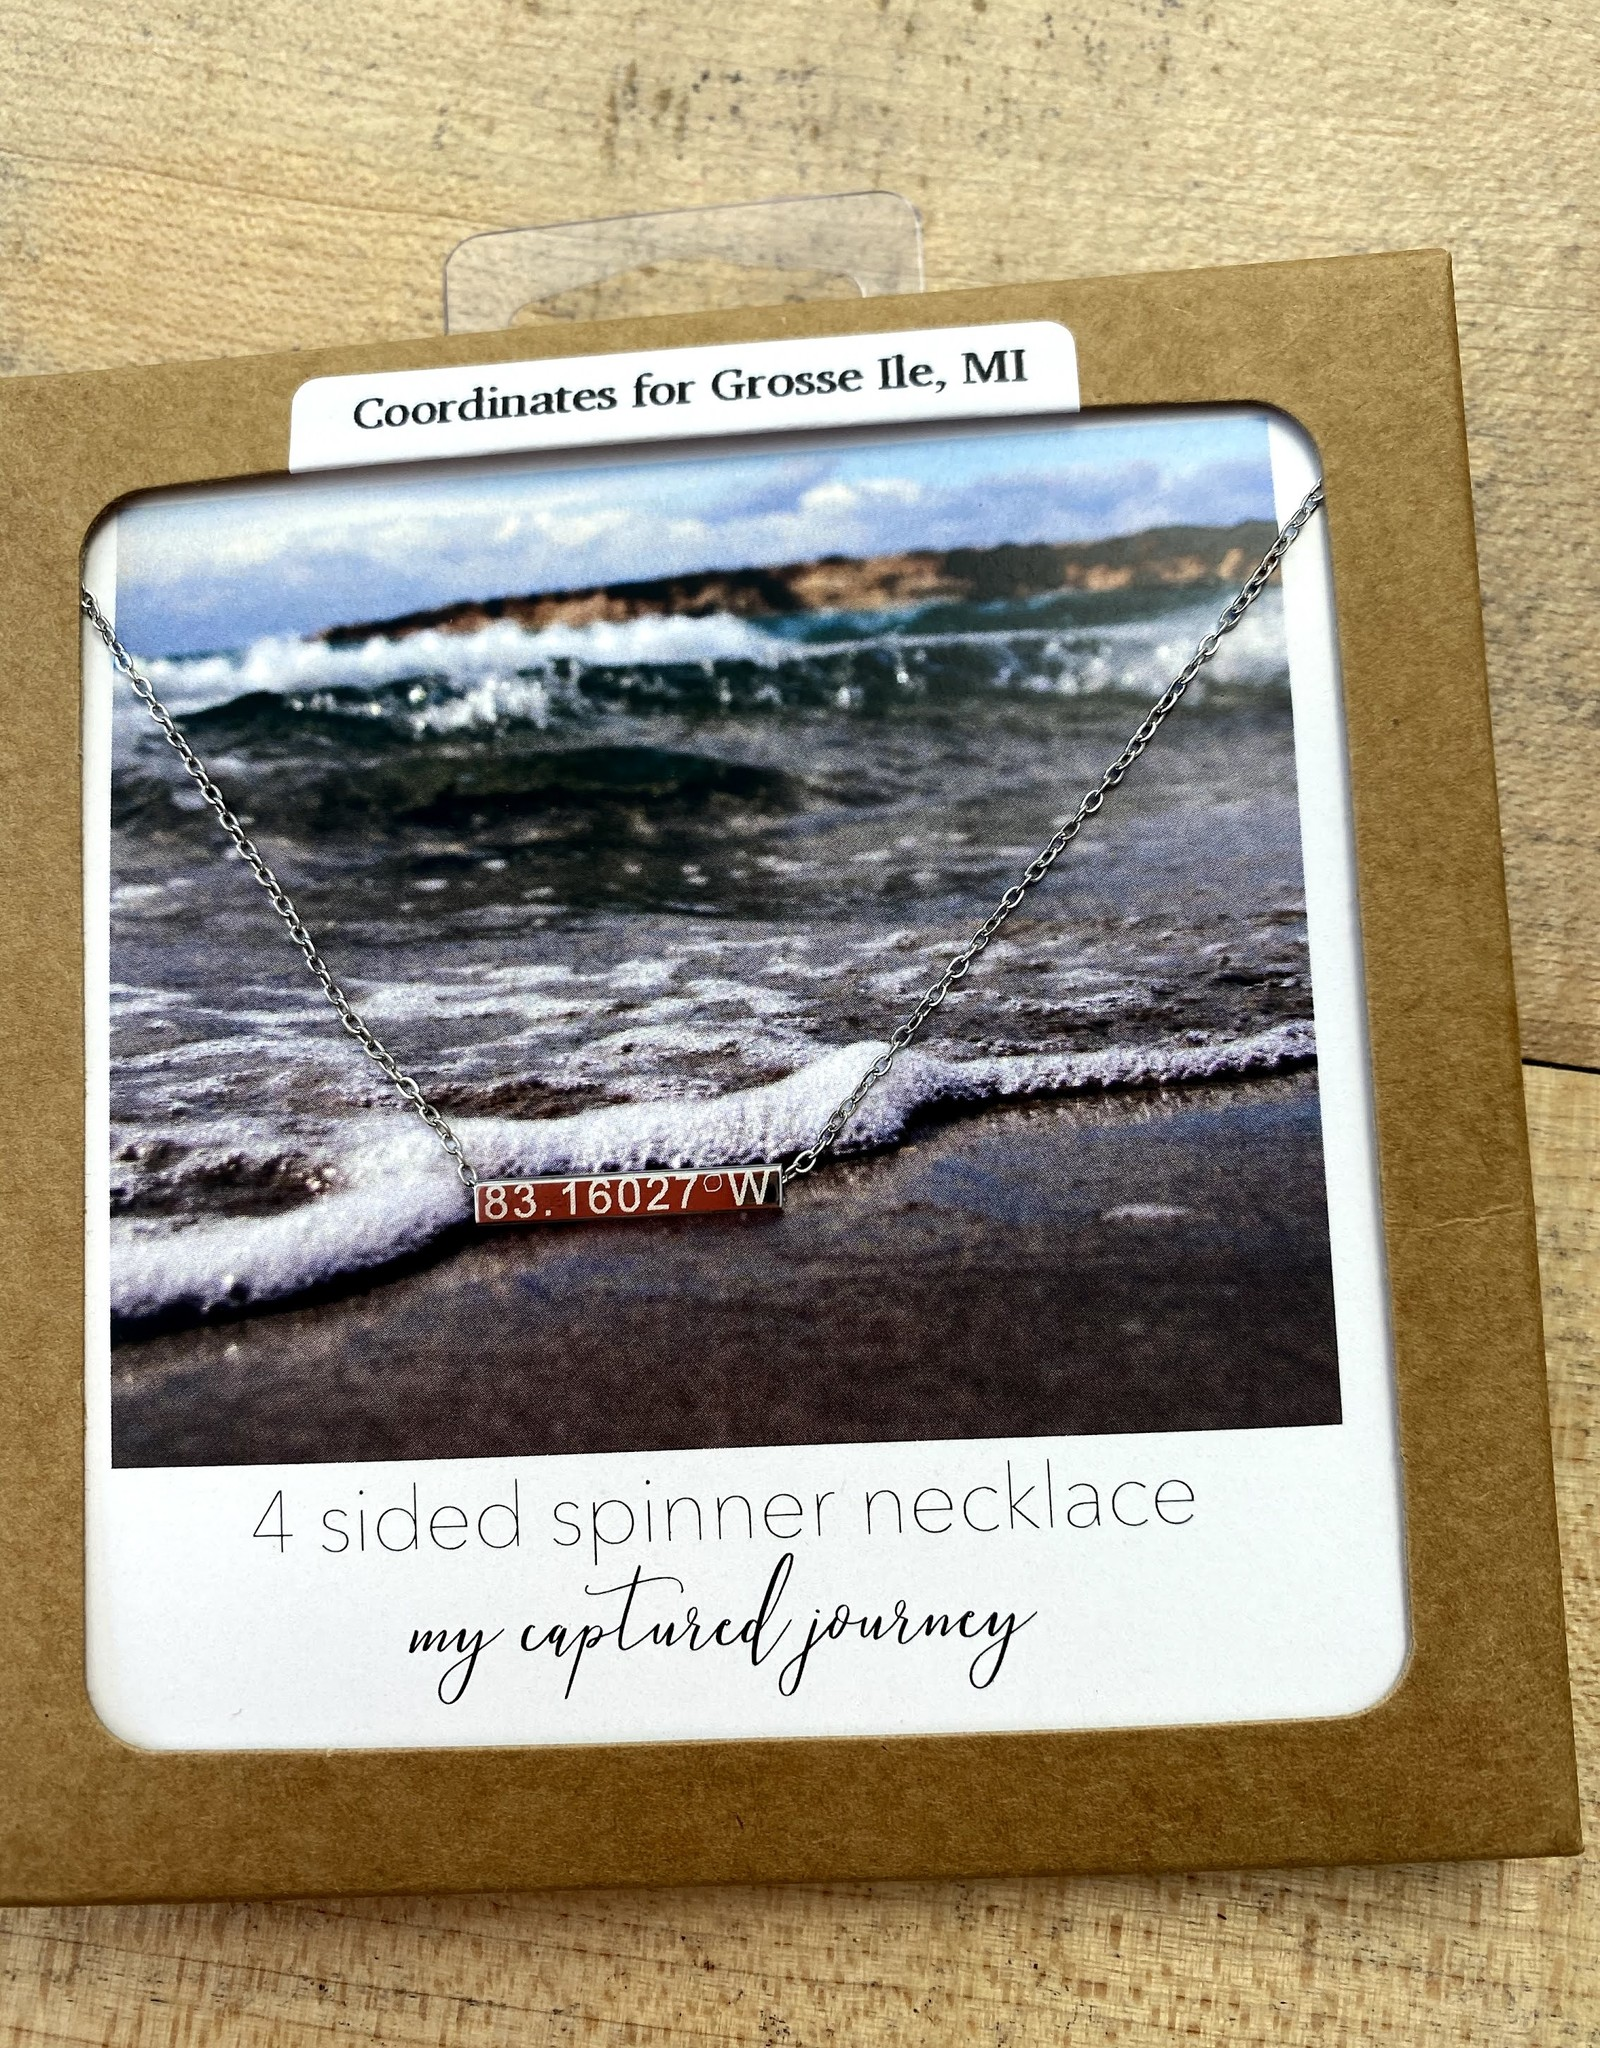 Captured Journey Grosse Ile   4 Sided Spinner Necklace